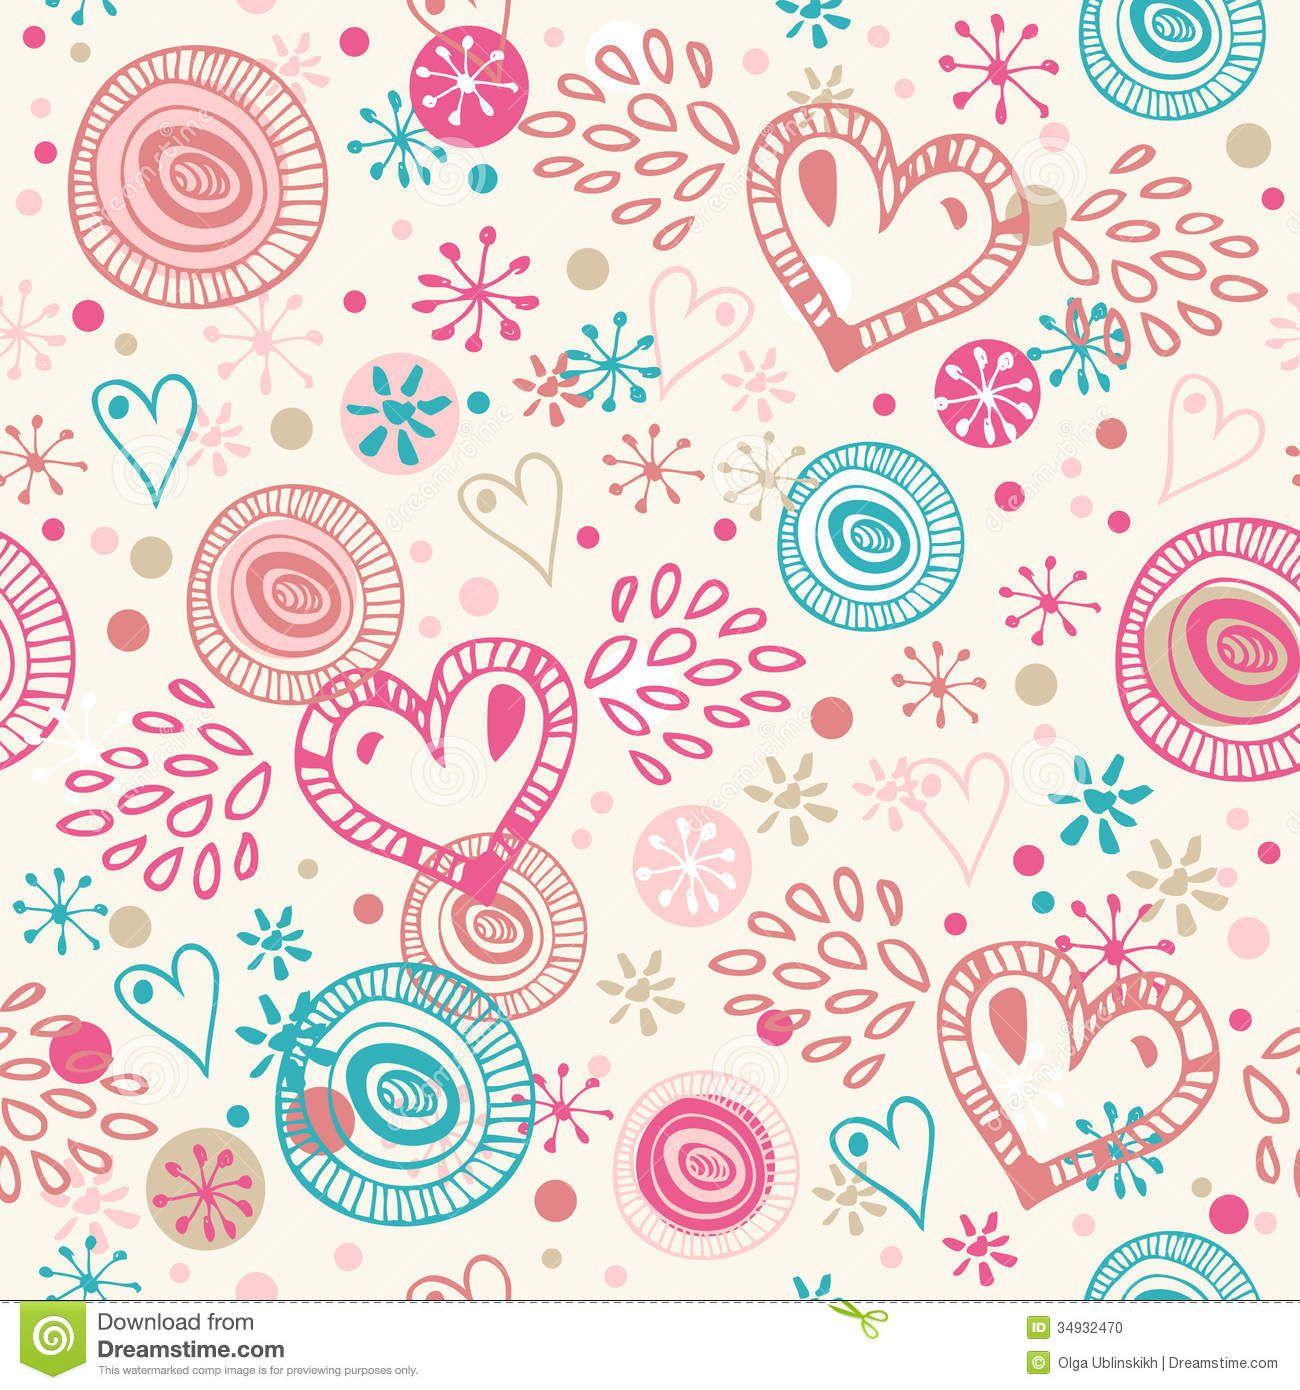 f3f846447ac37 vectores de flores gratis para descargar - Google Search